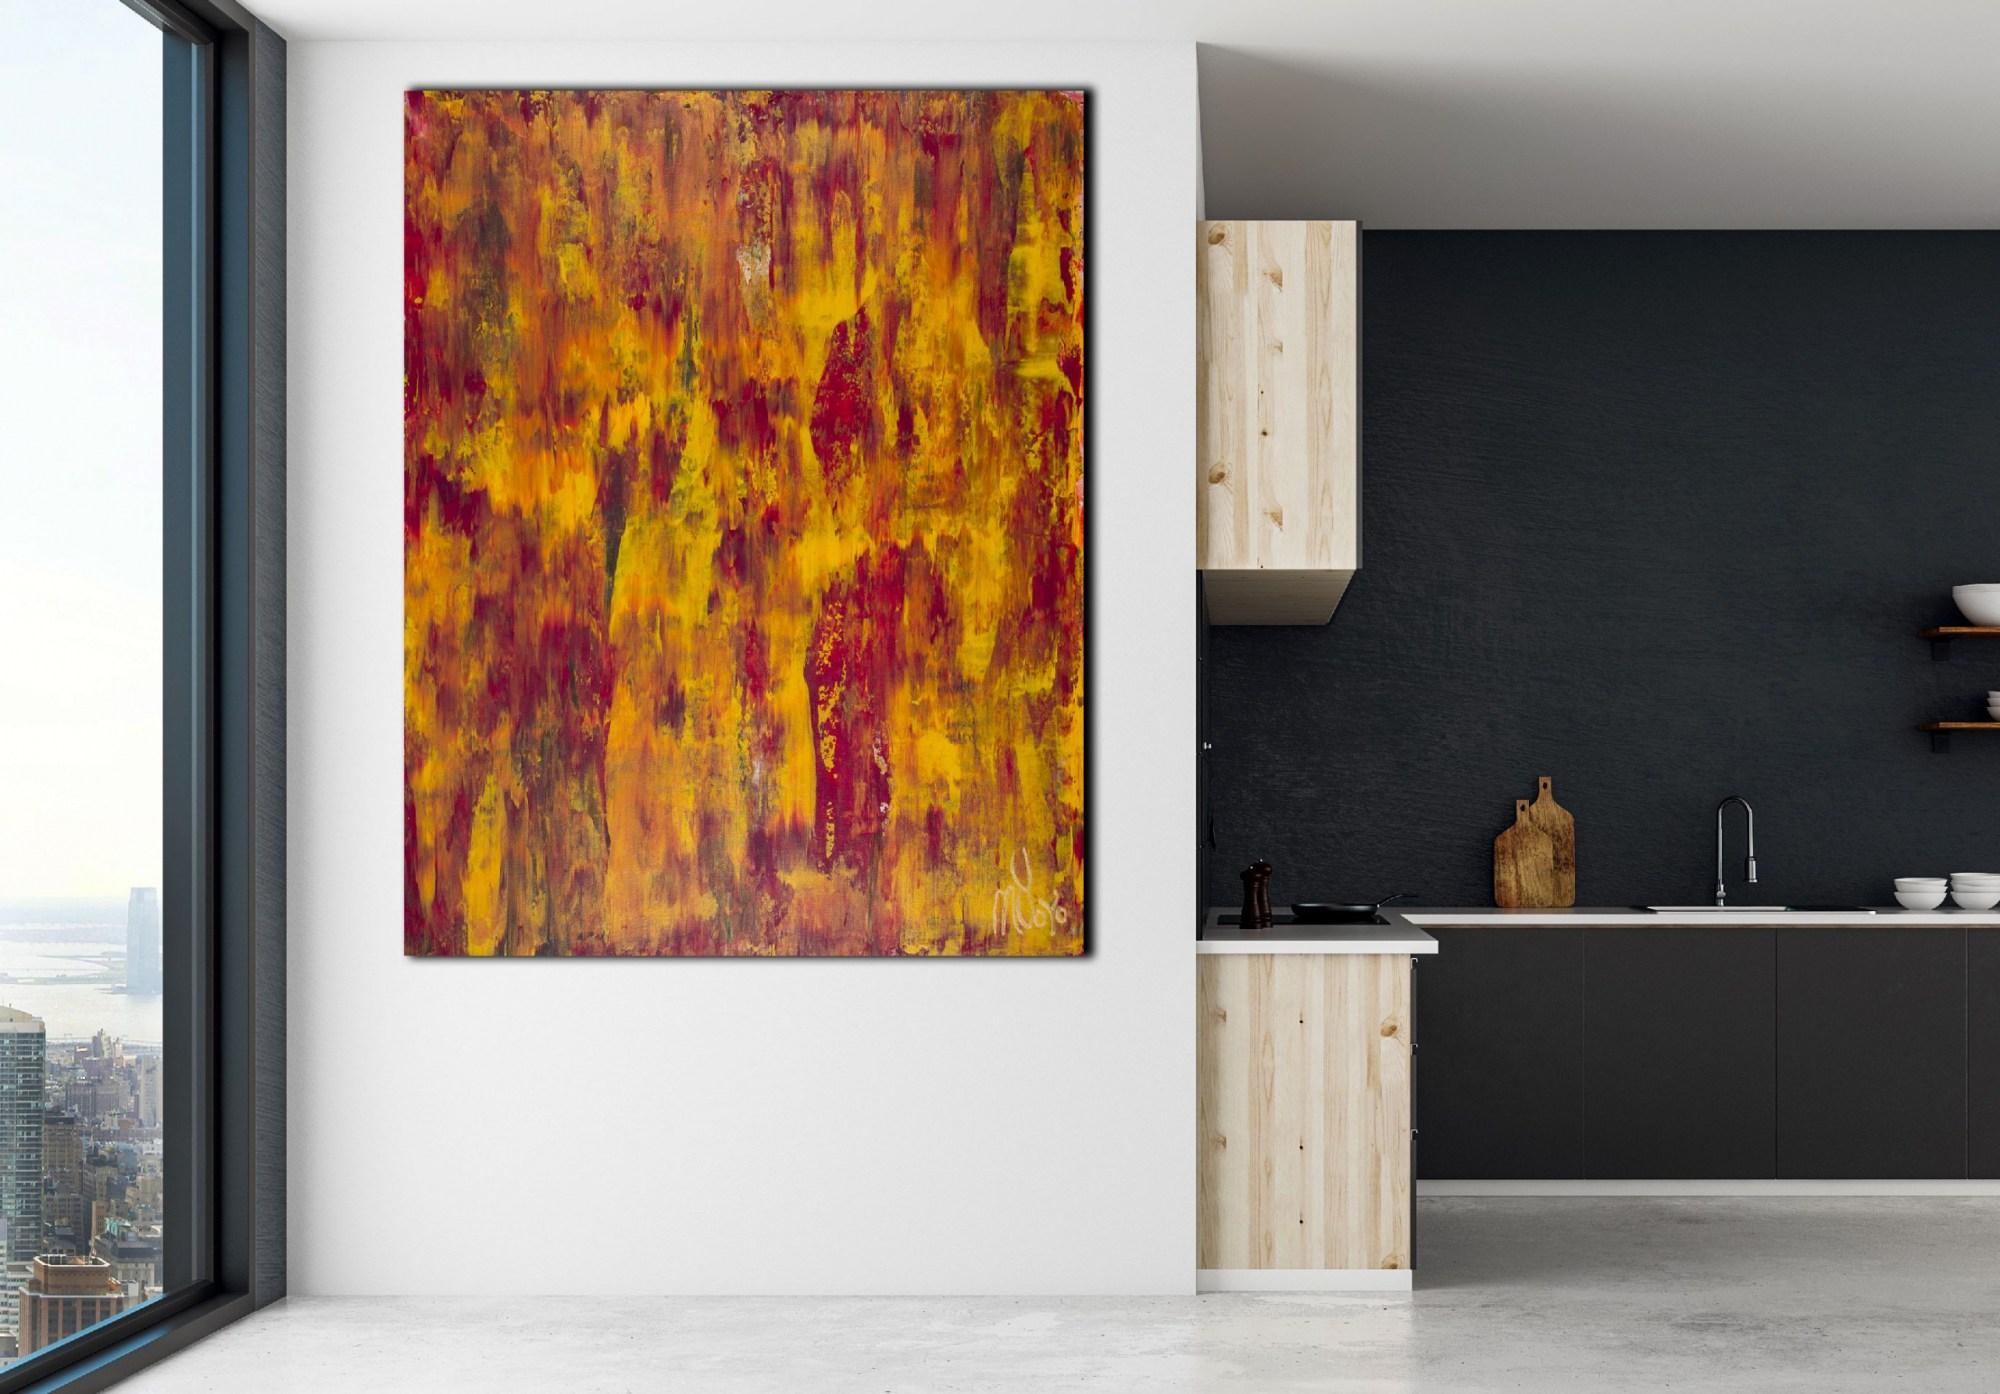 Room View / Fiery Dimensions 2 (2020) by Nestor Toro